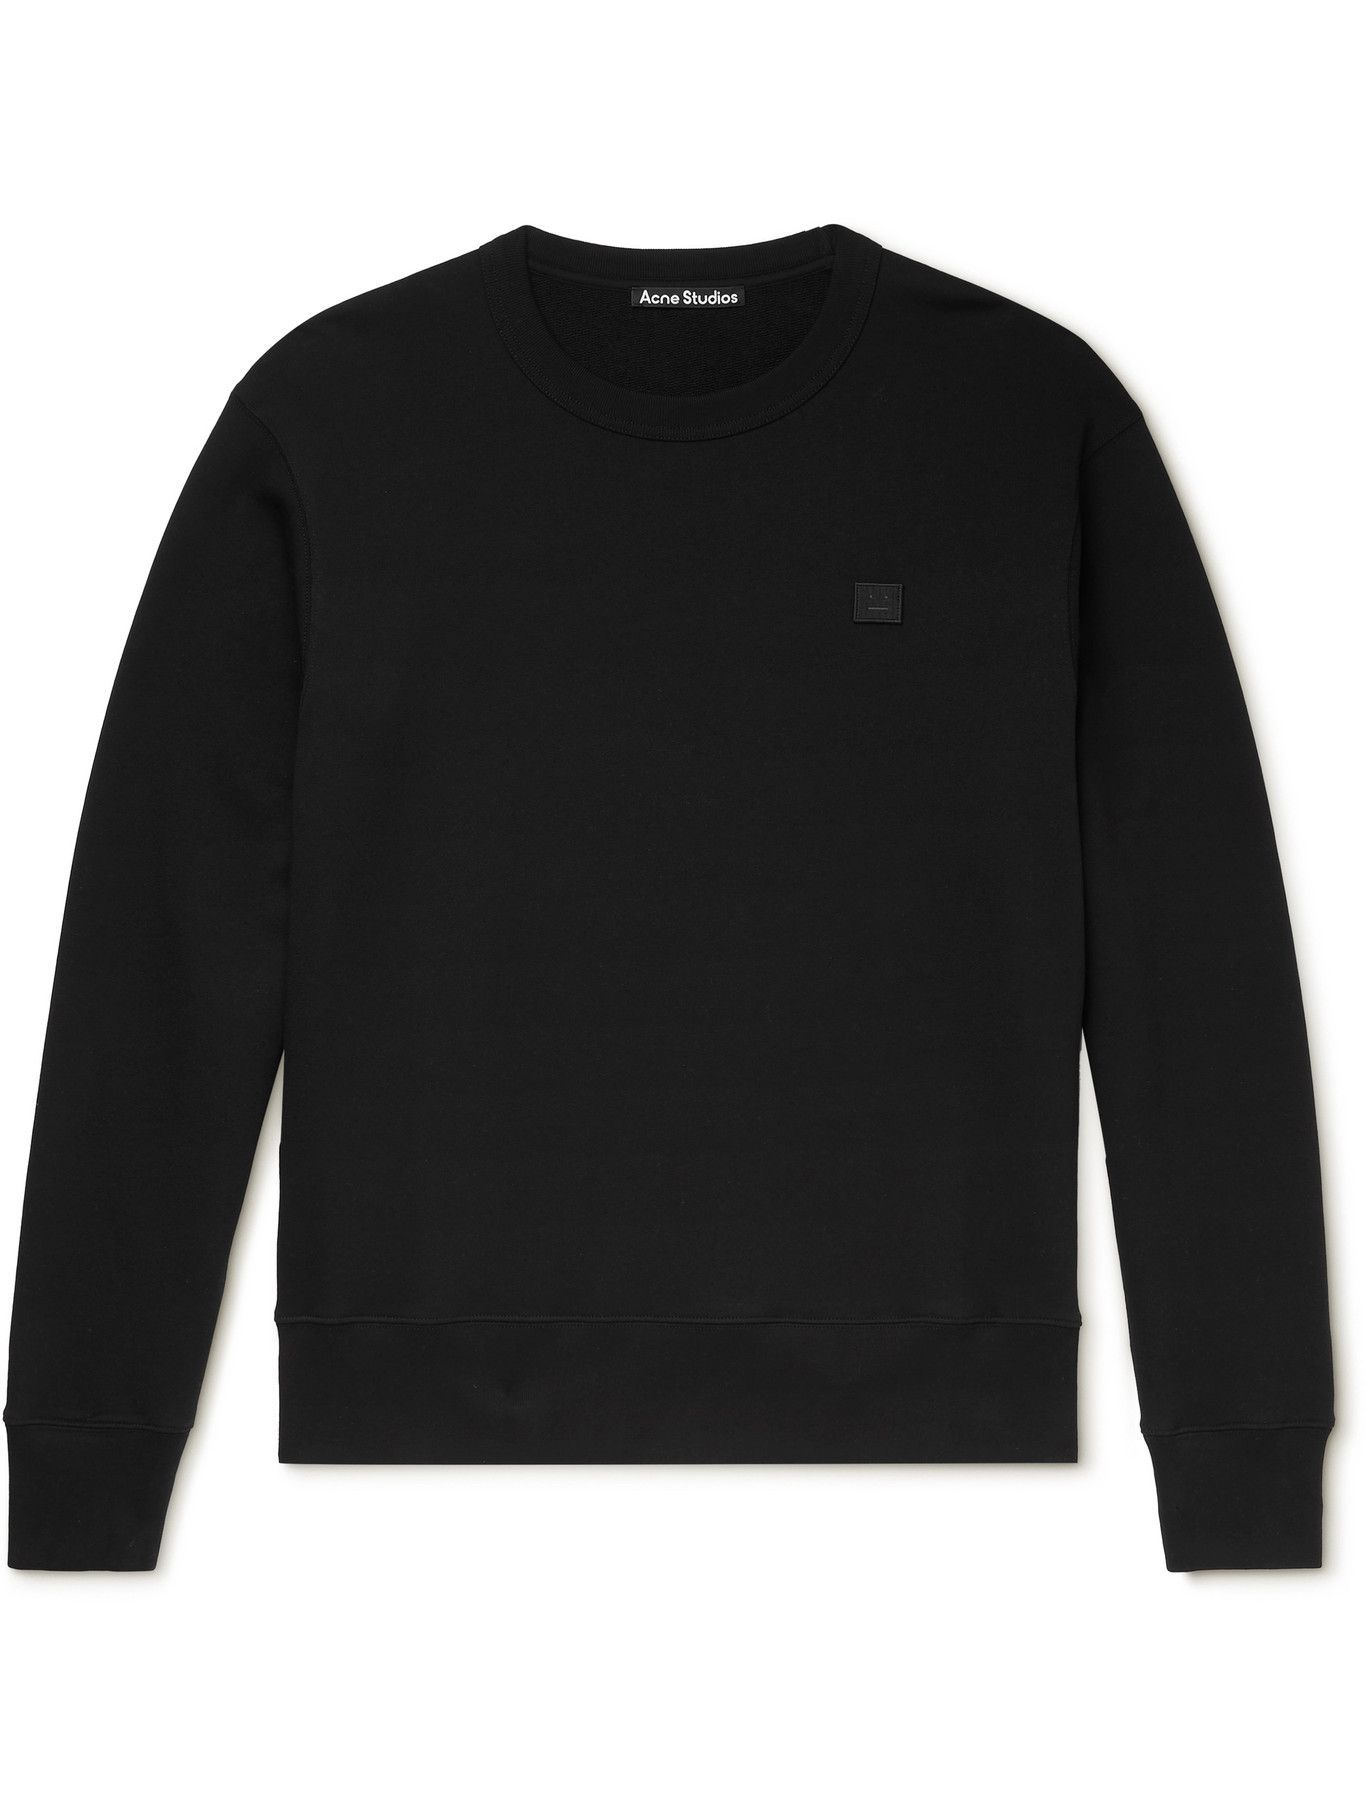 Photo: ACNE STUDIOS - Logo-Appliquéd Organic Cotton-Jersey Sweatshirt - Black